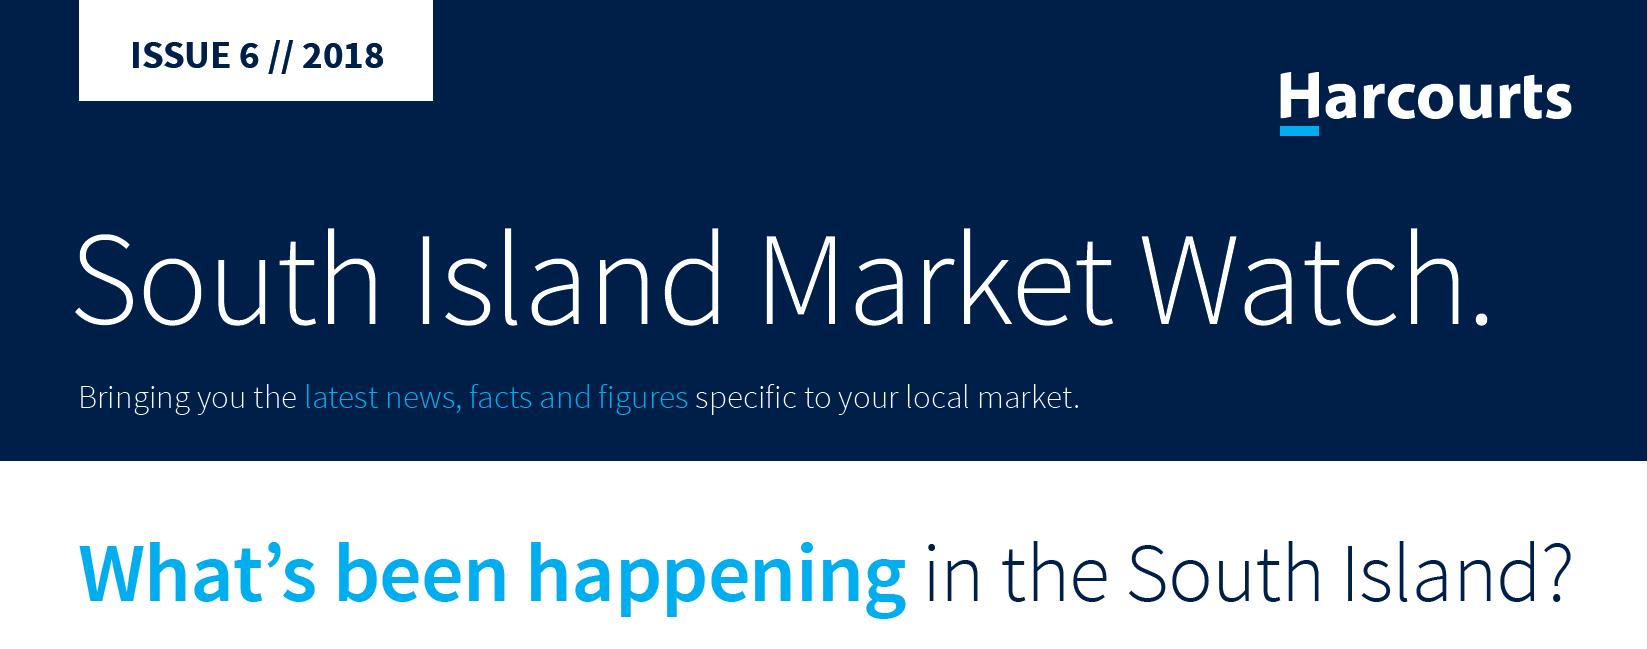 South Island Market Watch July 2018